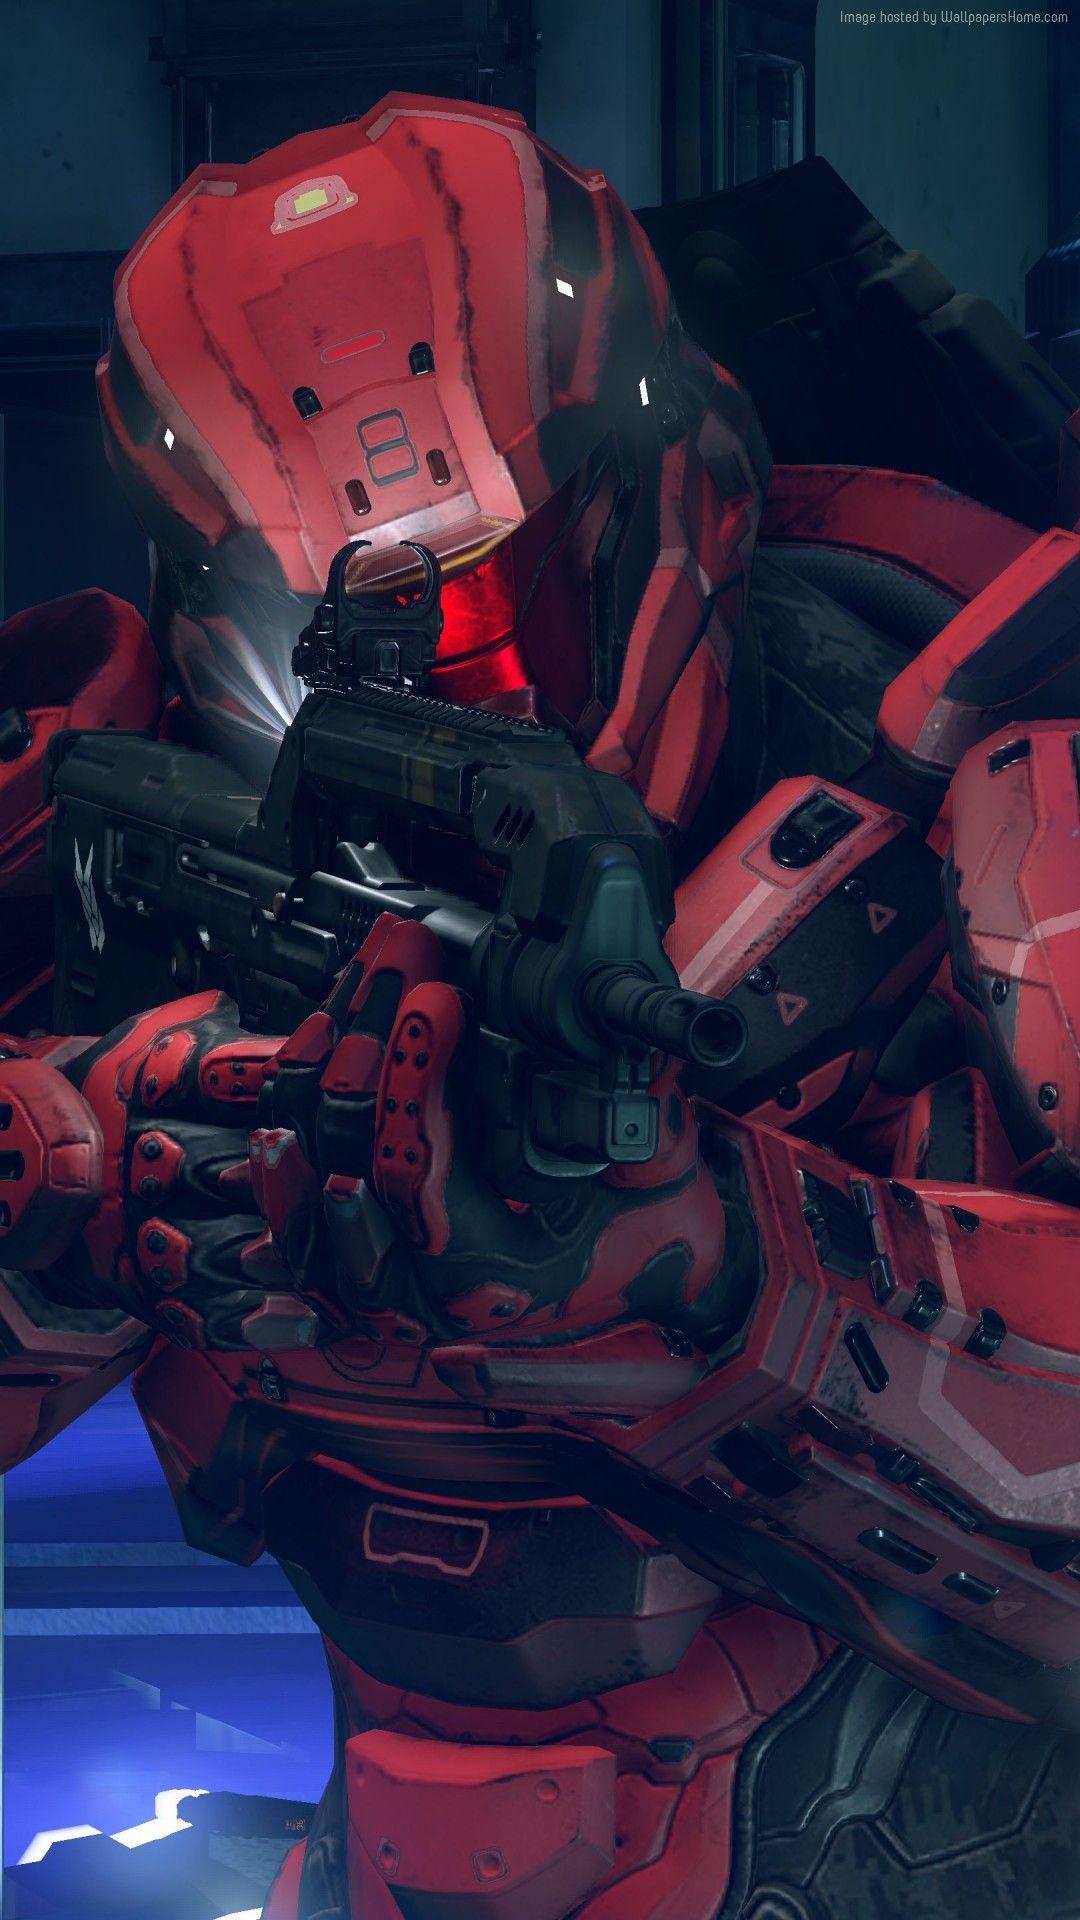 Halo 5 Guardians Game Mobile Hd Wallpaper In 2020 Halo 5 Halo Deadpool Hd Wallpaper